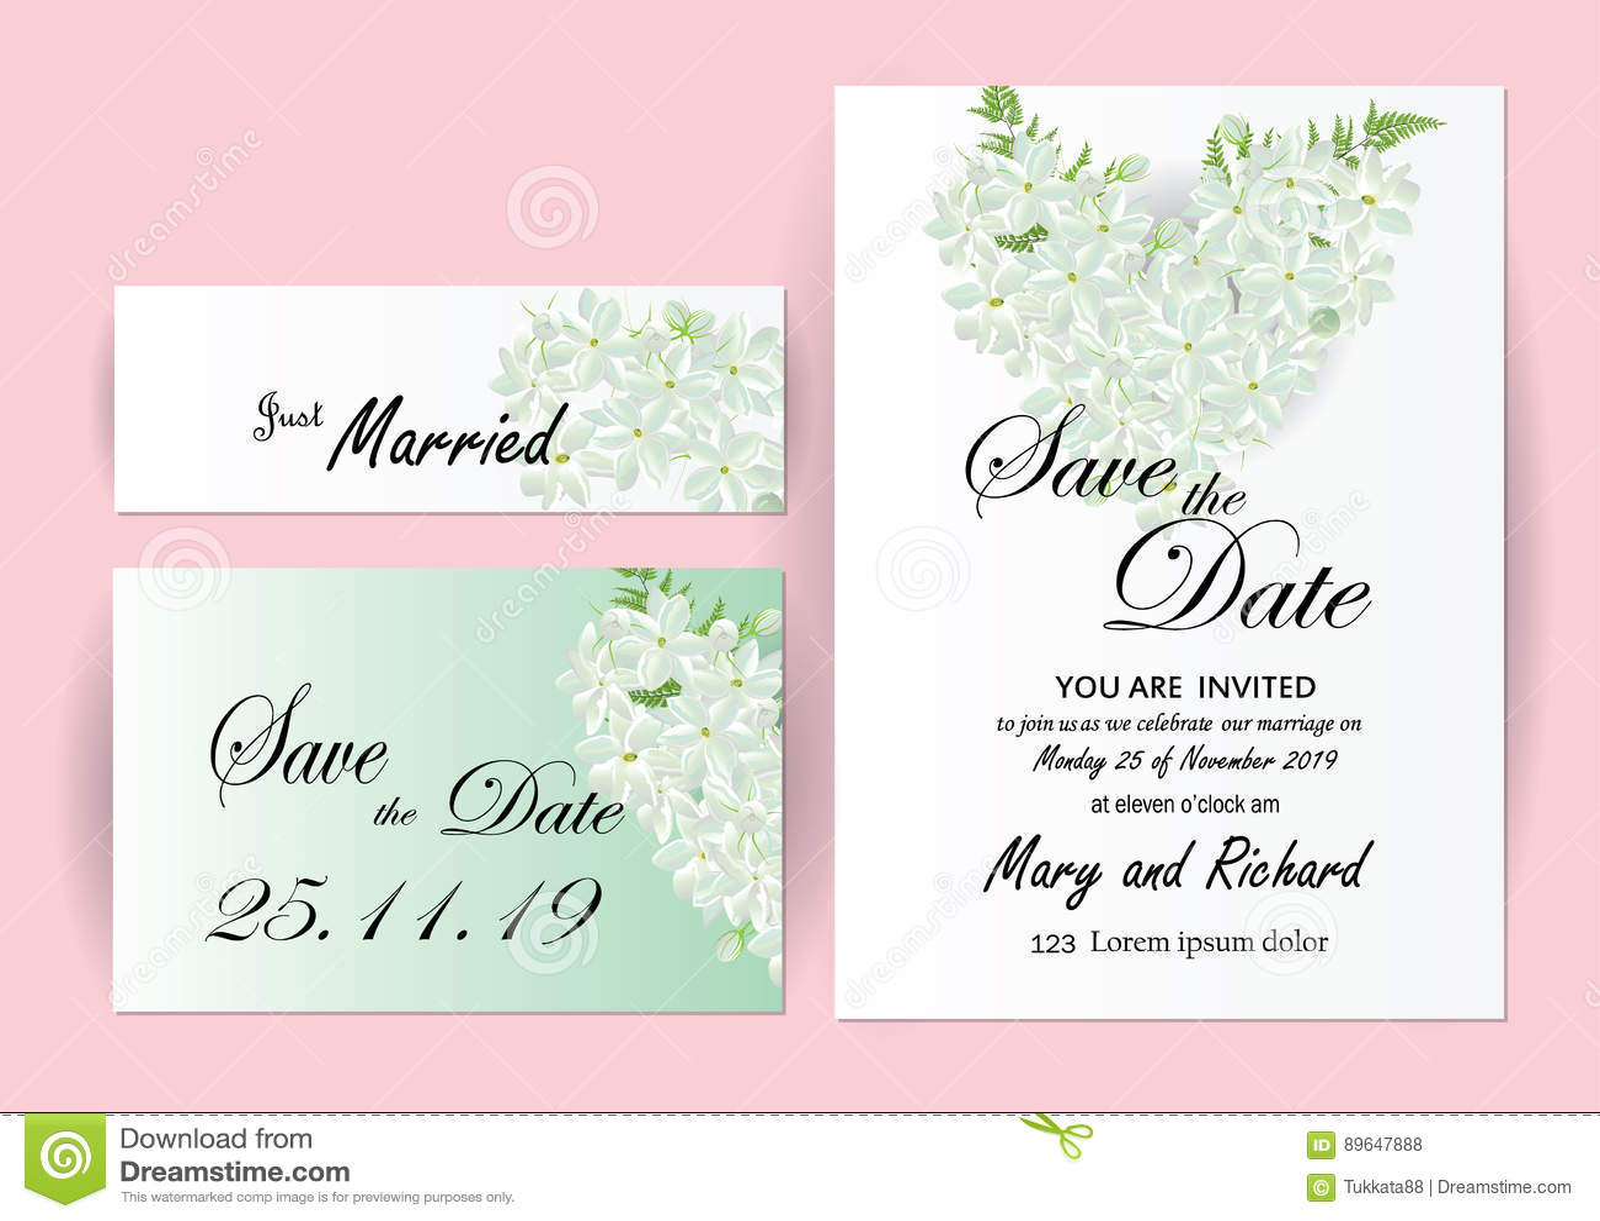 Wedding Invitation Card Flowers,jasmine Stock Vector - Illustration ...